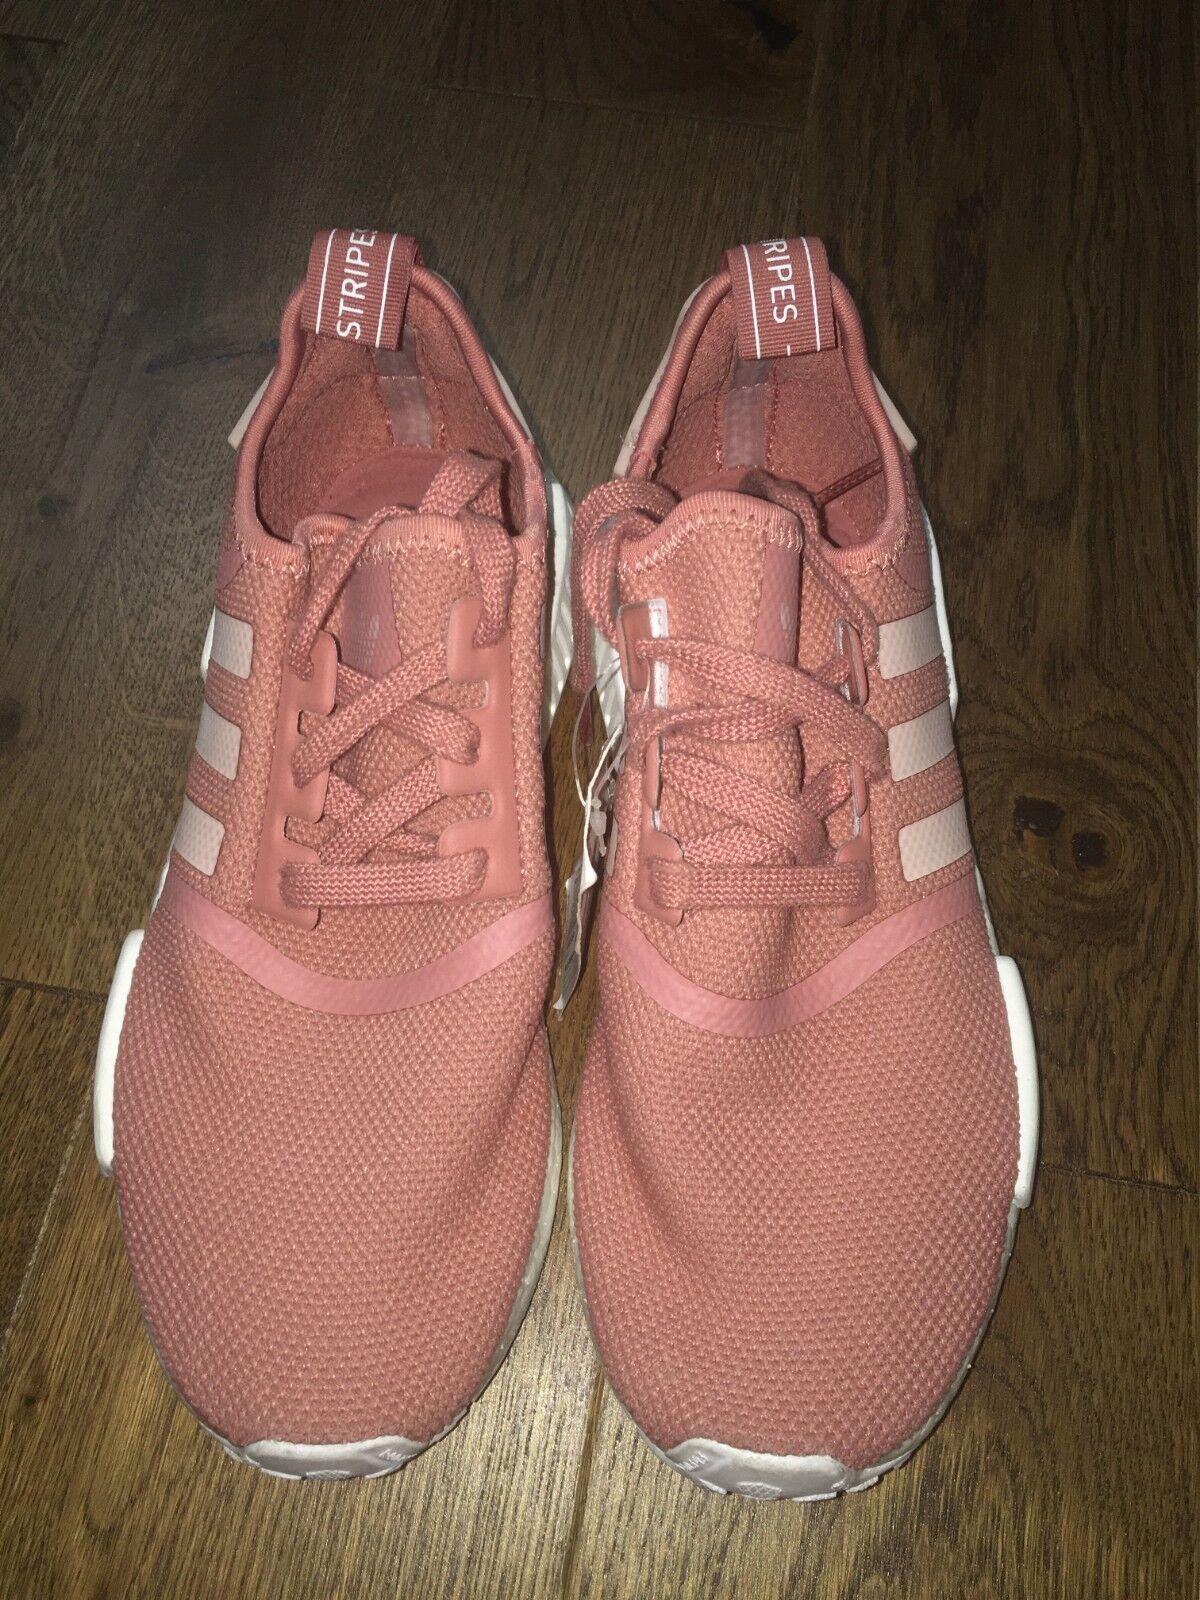 Adidas NMD R1 Nomad Women's Women's Women's Vapour Pink S76006 Originals pink Salmon Runner Rare e98e7e